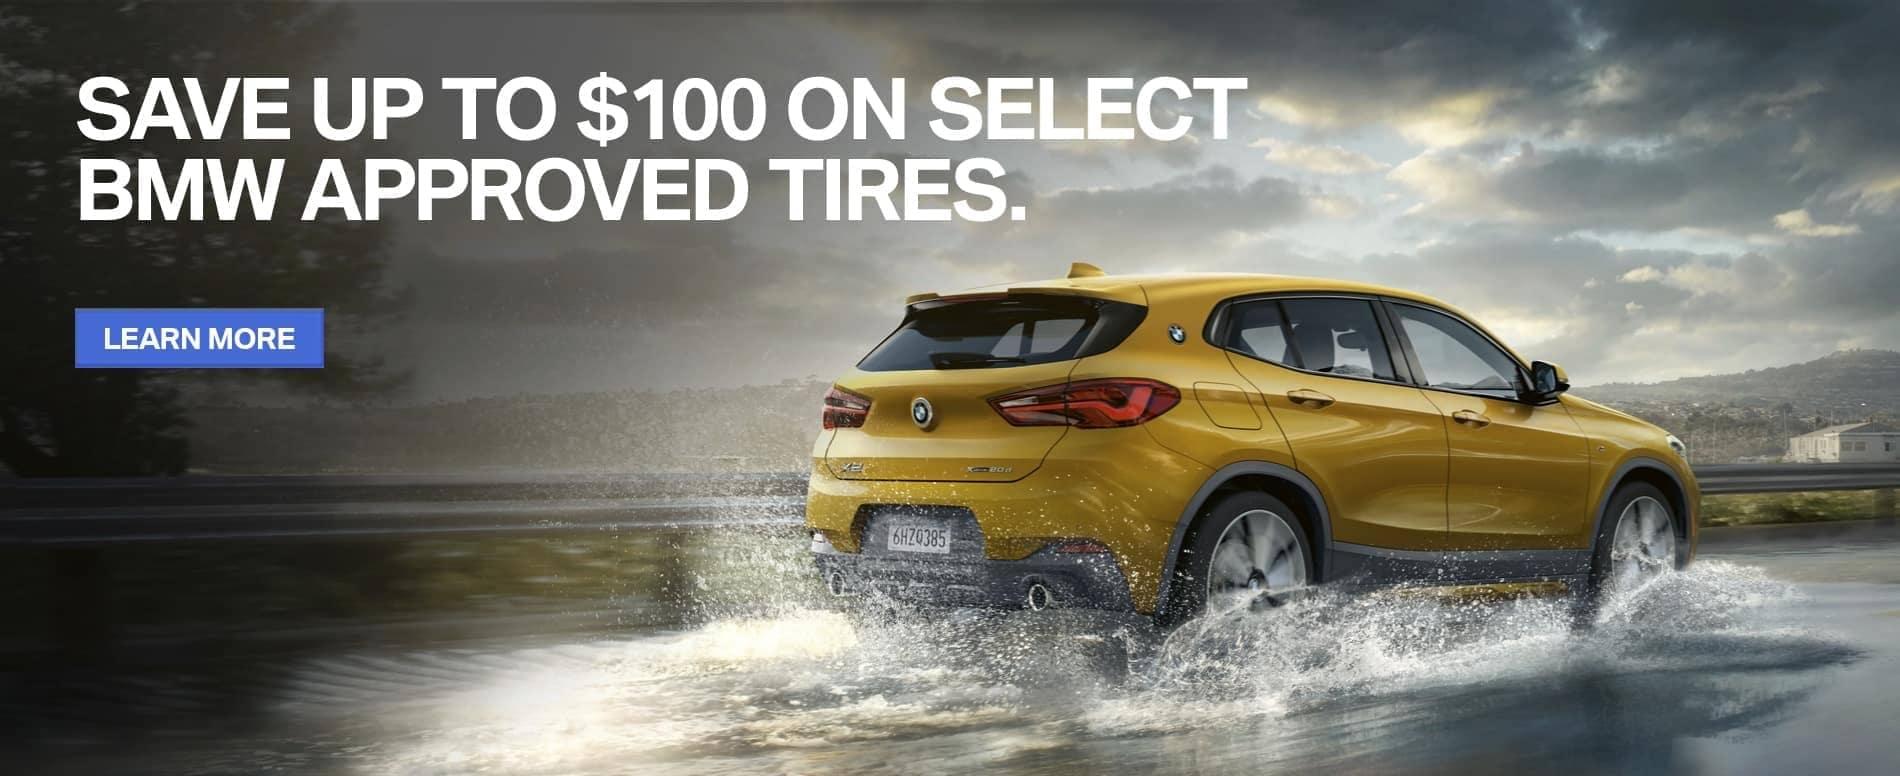 BMW_Tires